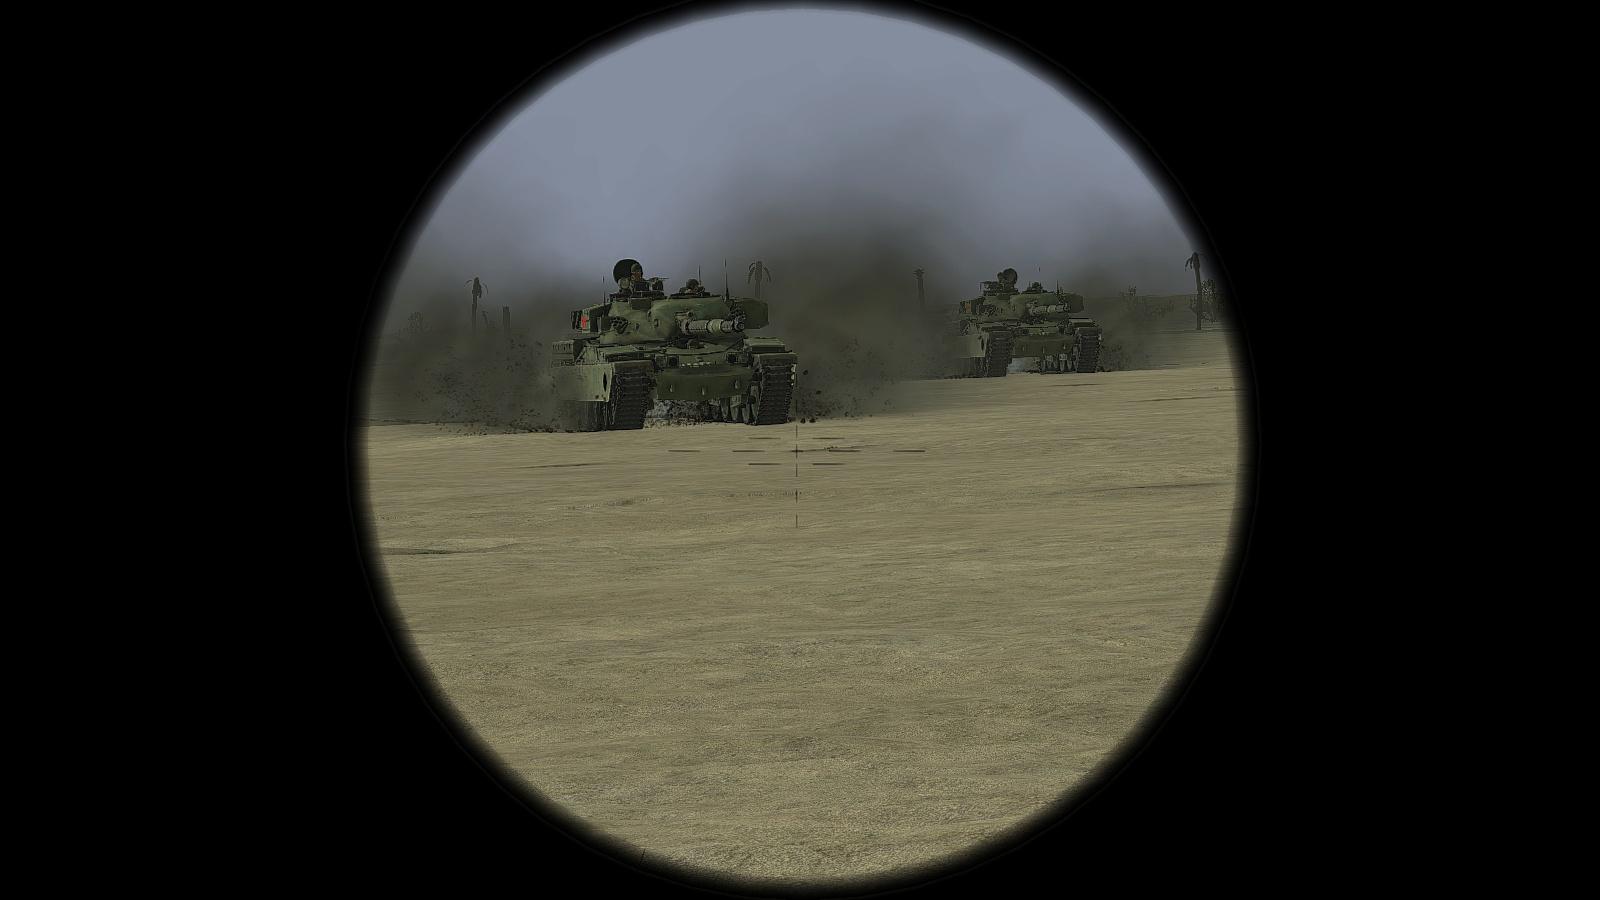 Steel Armor Blaze of War - Chieftains in M60 gunner's sight